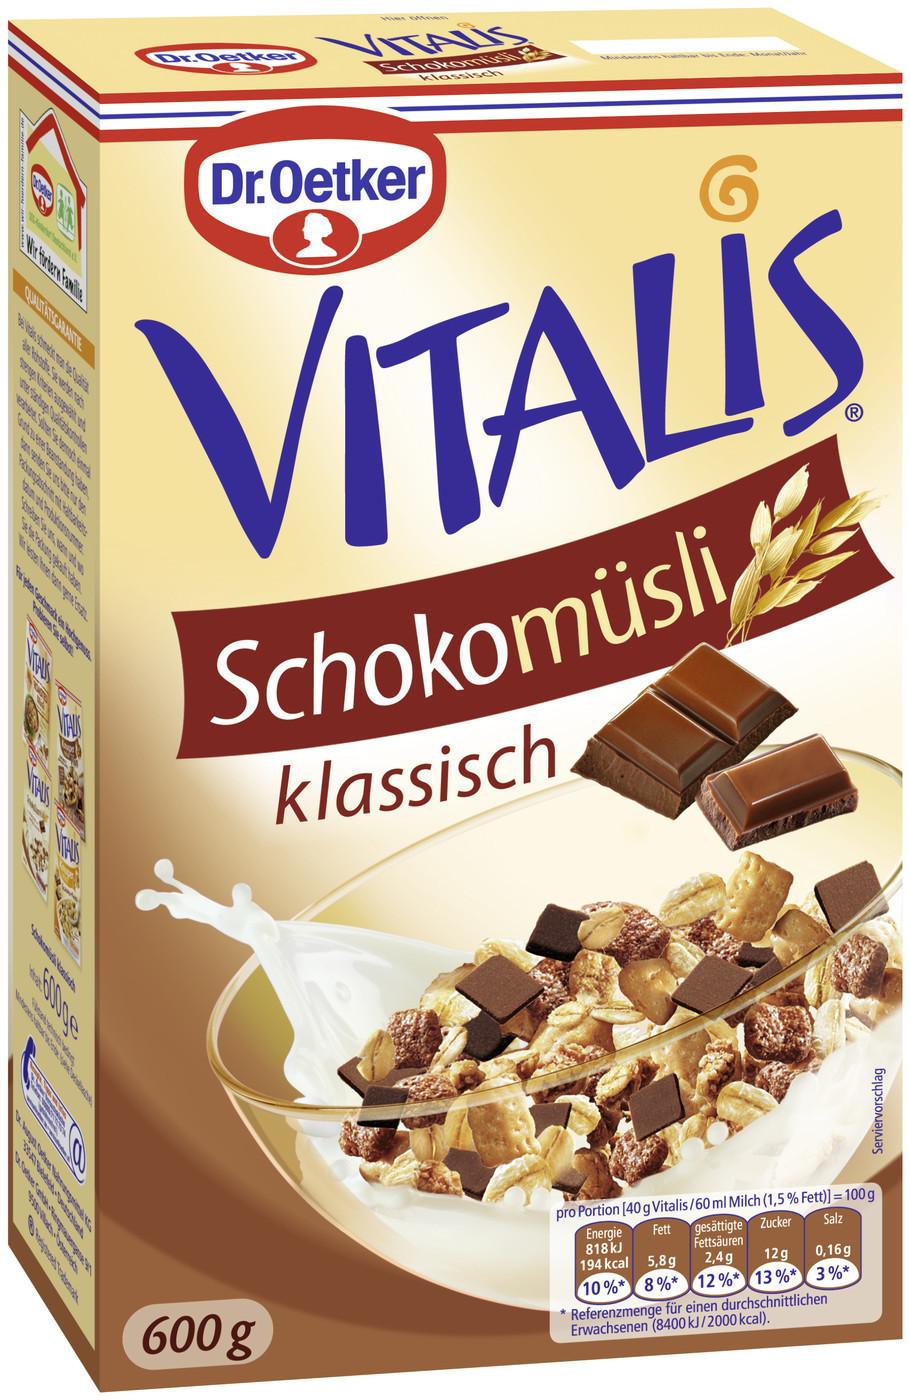 Dr. Oetker Vitalis Schoko Müsli klassisch (600 g)